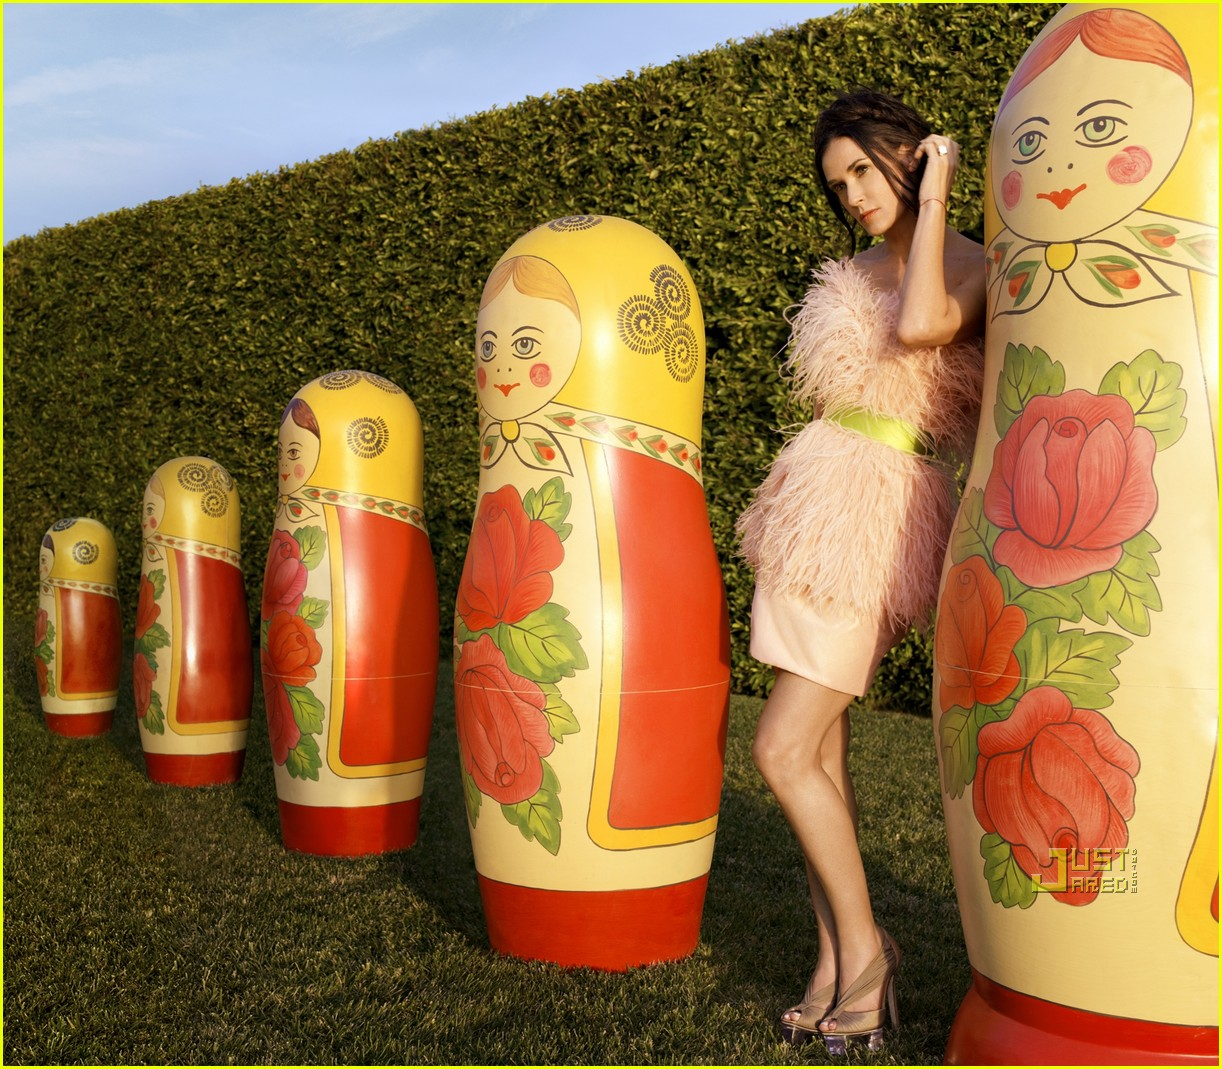 http://1.bp.blogspot.com/-URxcCCtjh8g/TmLGTYA_pwI/AAAAAAAAAe4/OwDnf4wcA40/s1600/demi-moore-harpers-bazaar-april-2010-cover-02.jpg